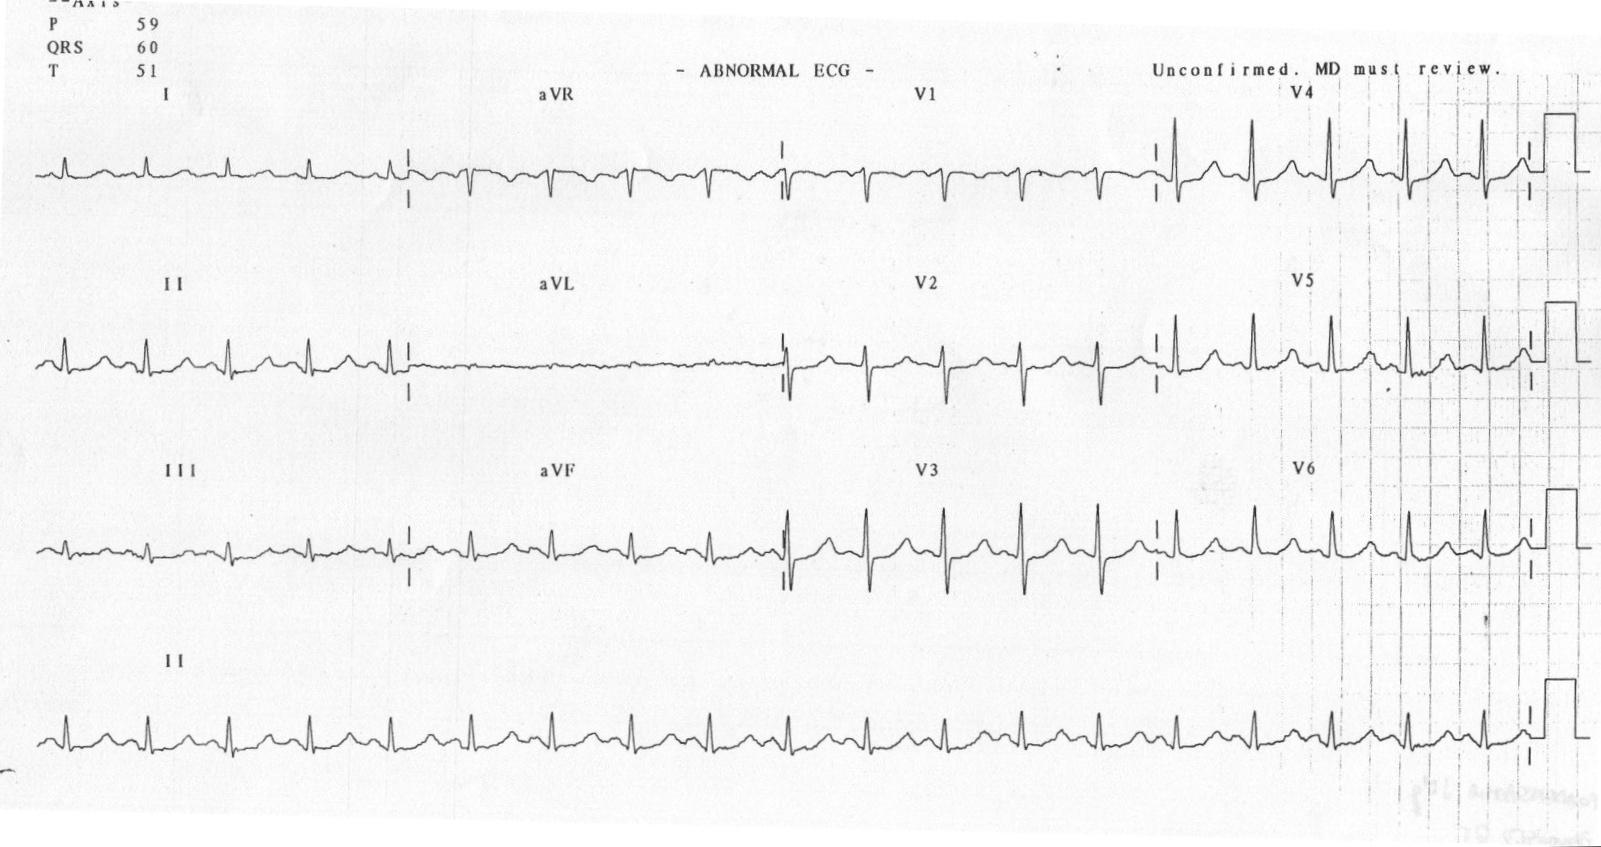 Uzun QTc'ye (510 ms) neden olan hipomagnezemi Kaynak : lifeinthefastlane.com - ECG library